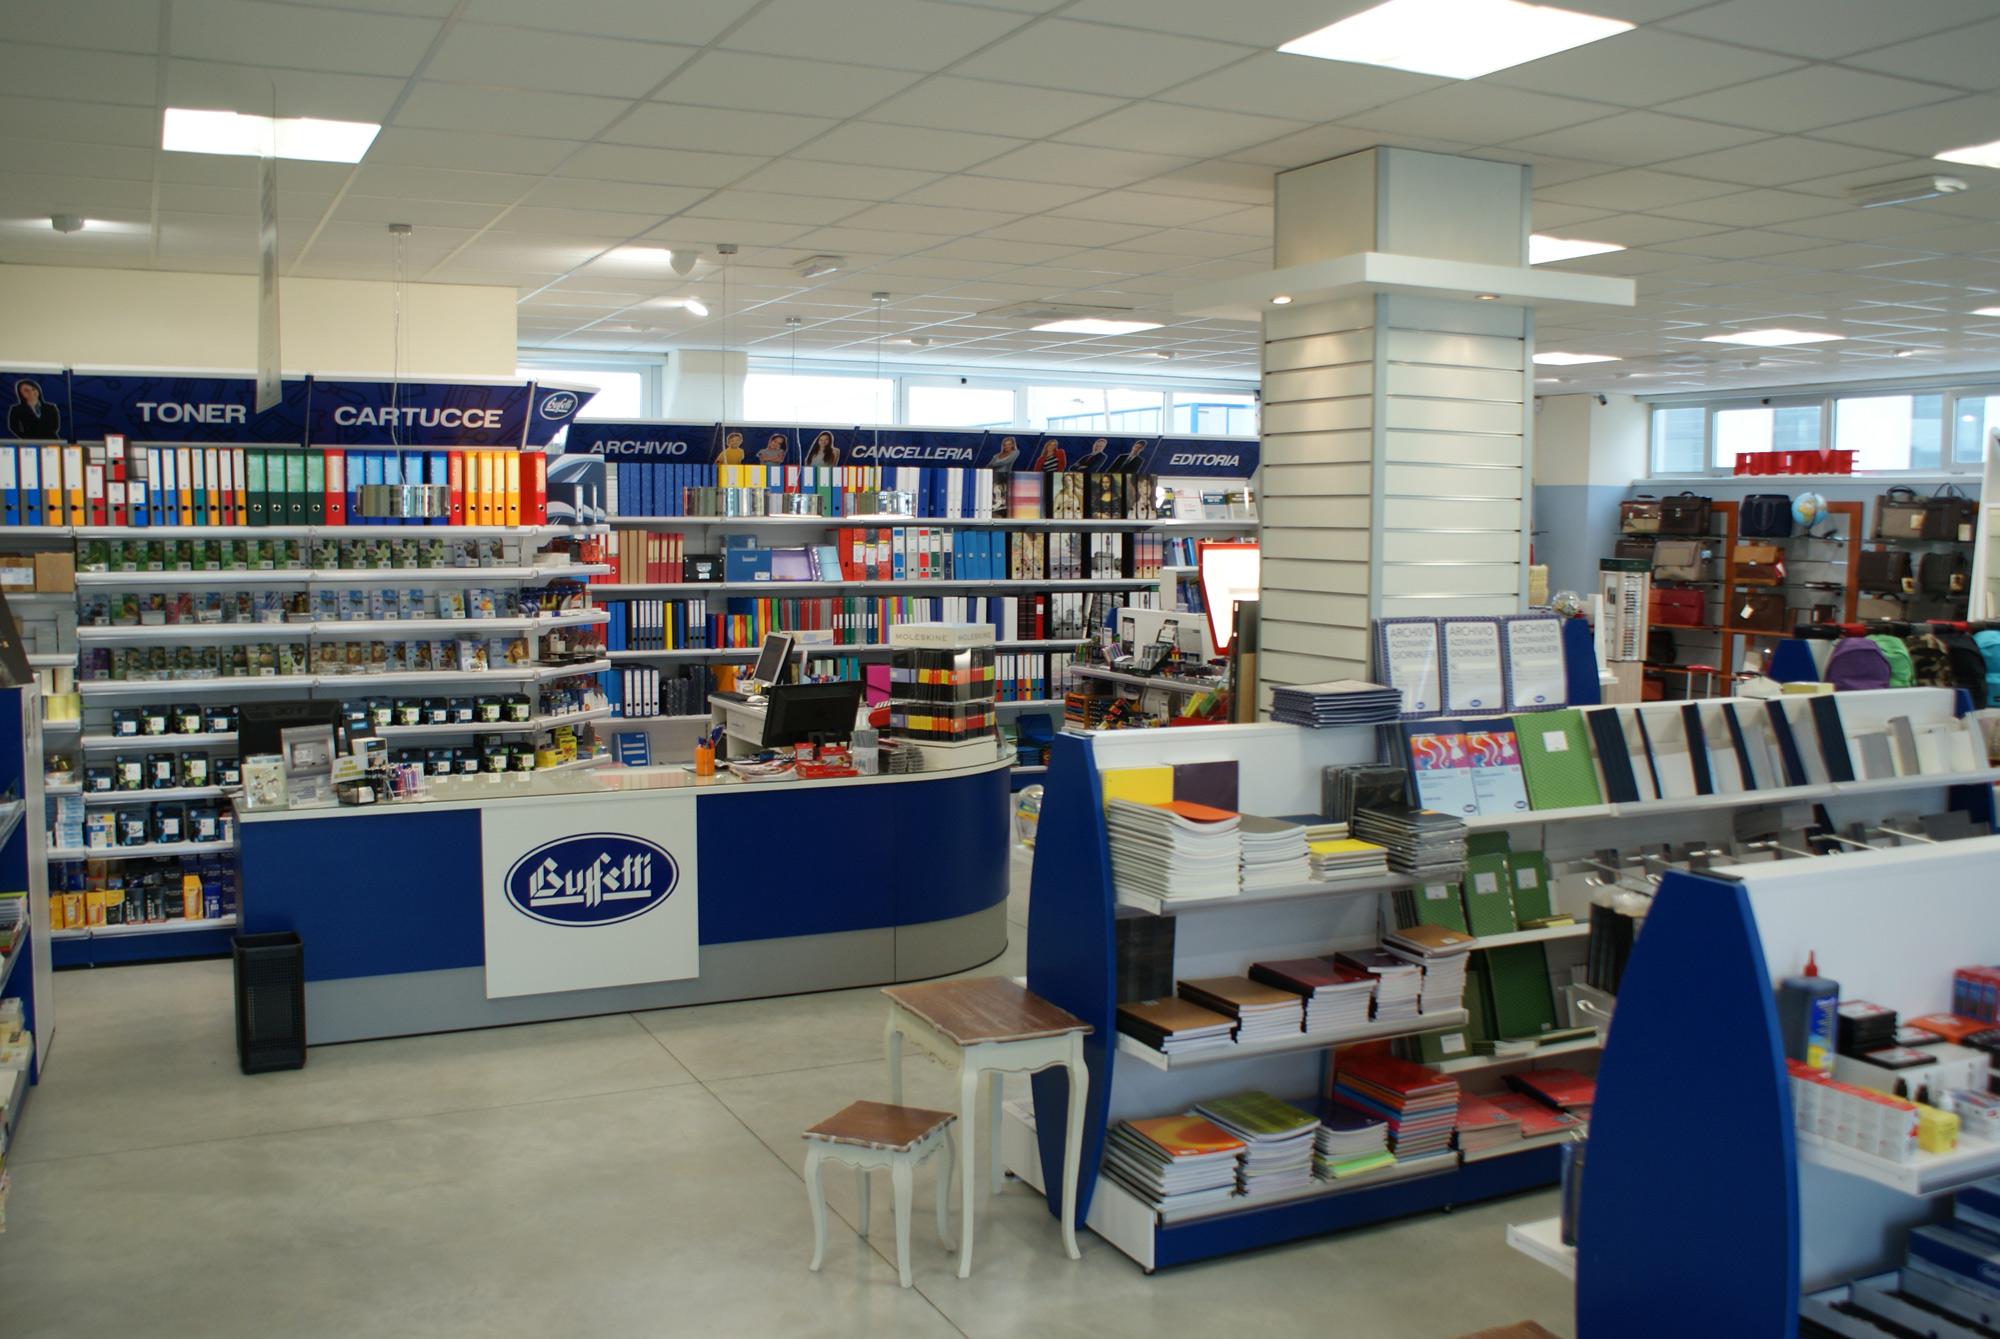 Arredamento per negozi di cartoleria cancelleria toscana for Arredamento toscana